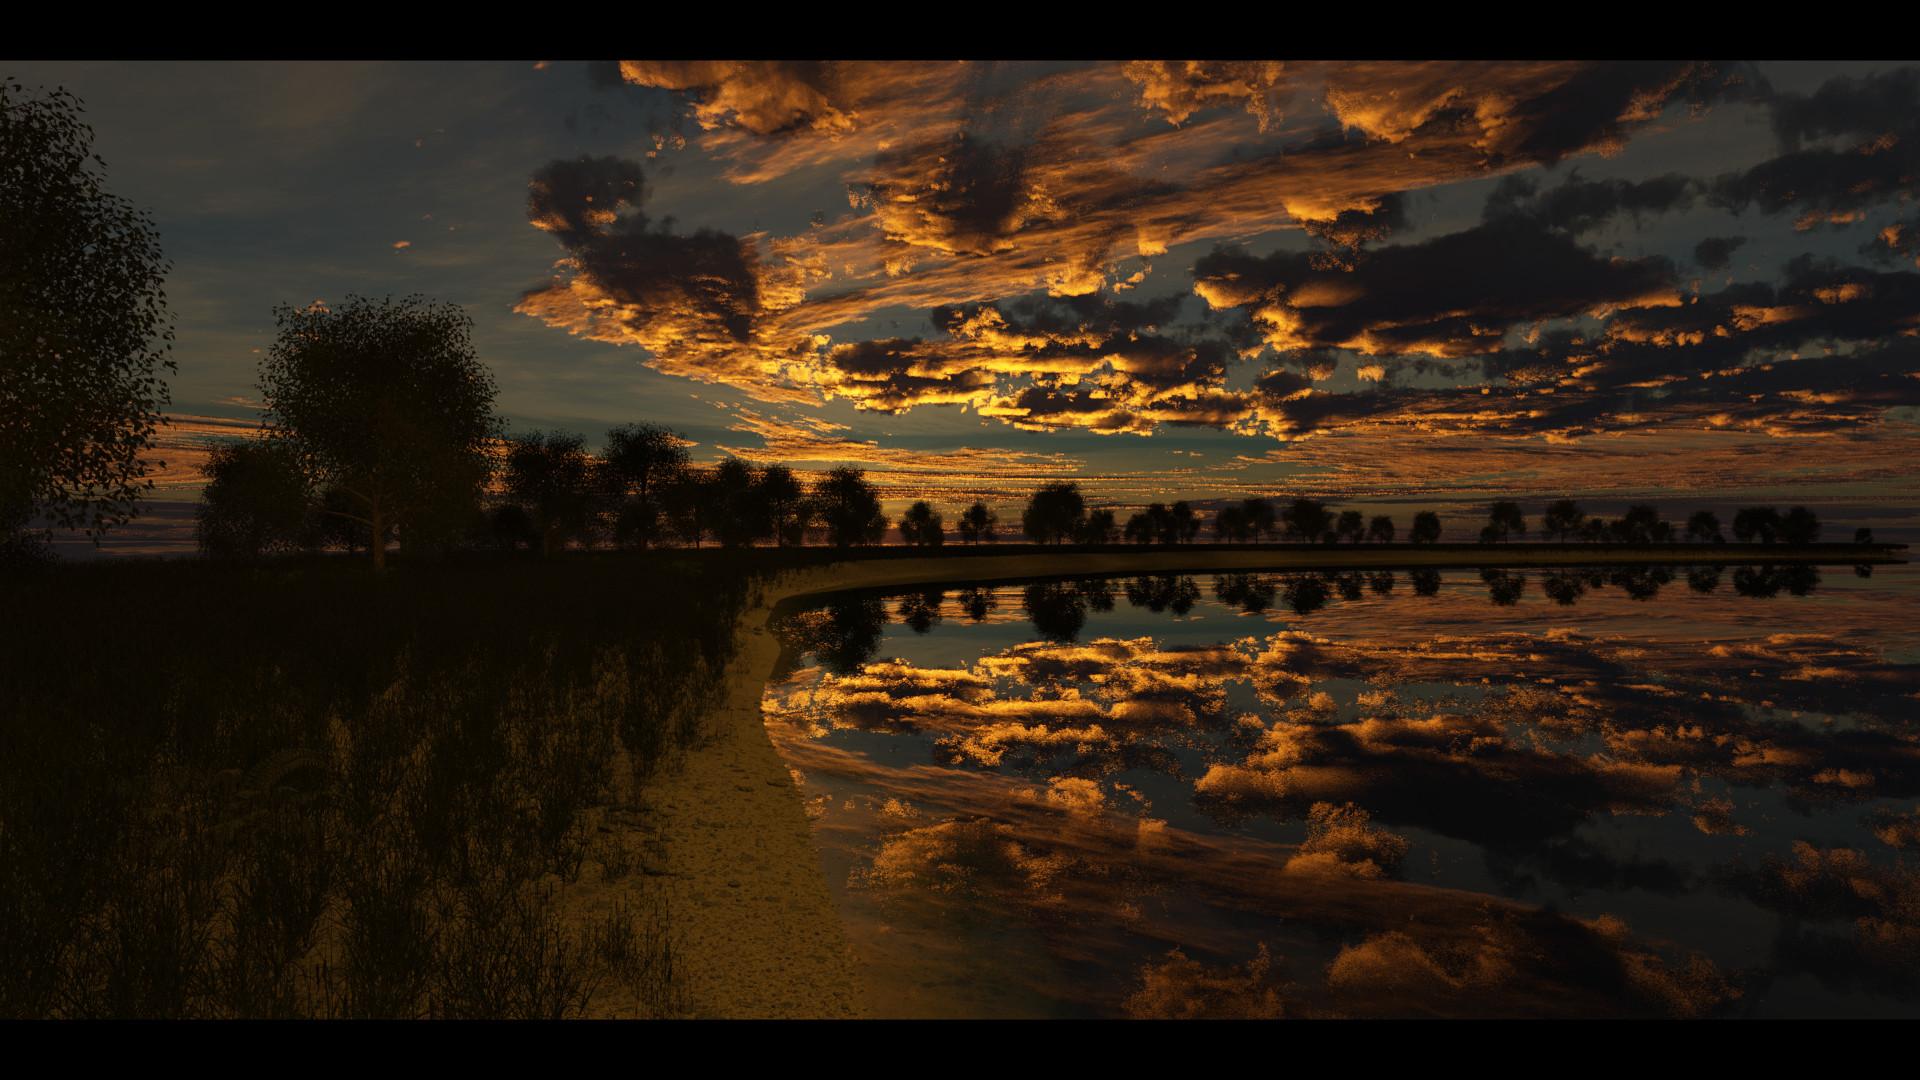 The sky by SwissAdA